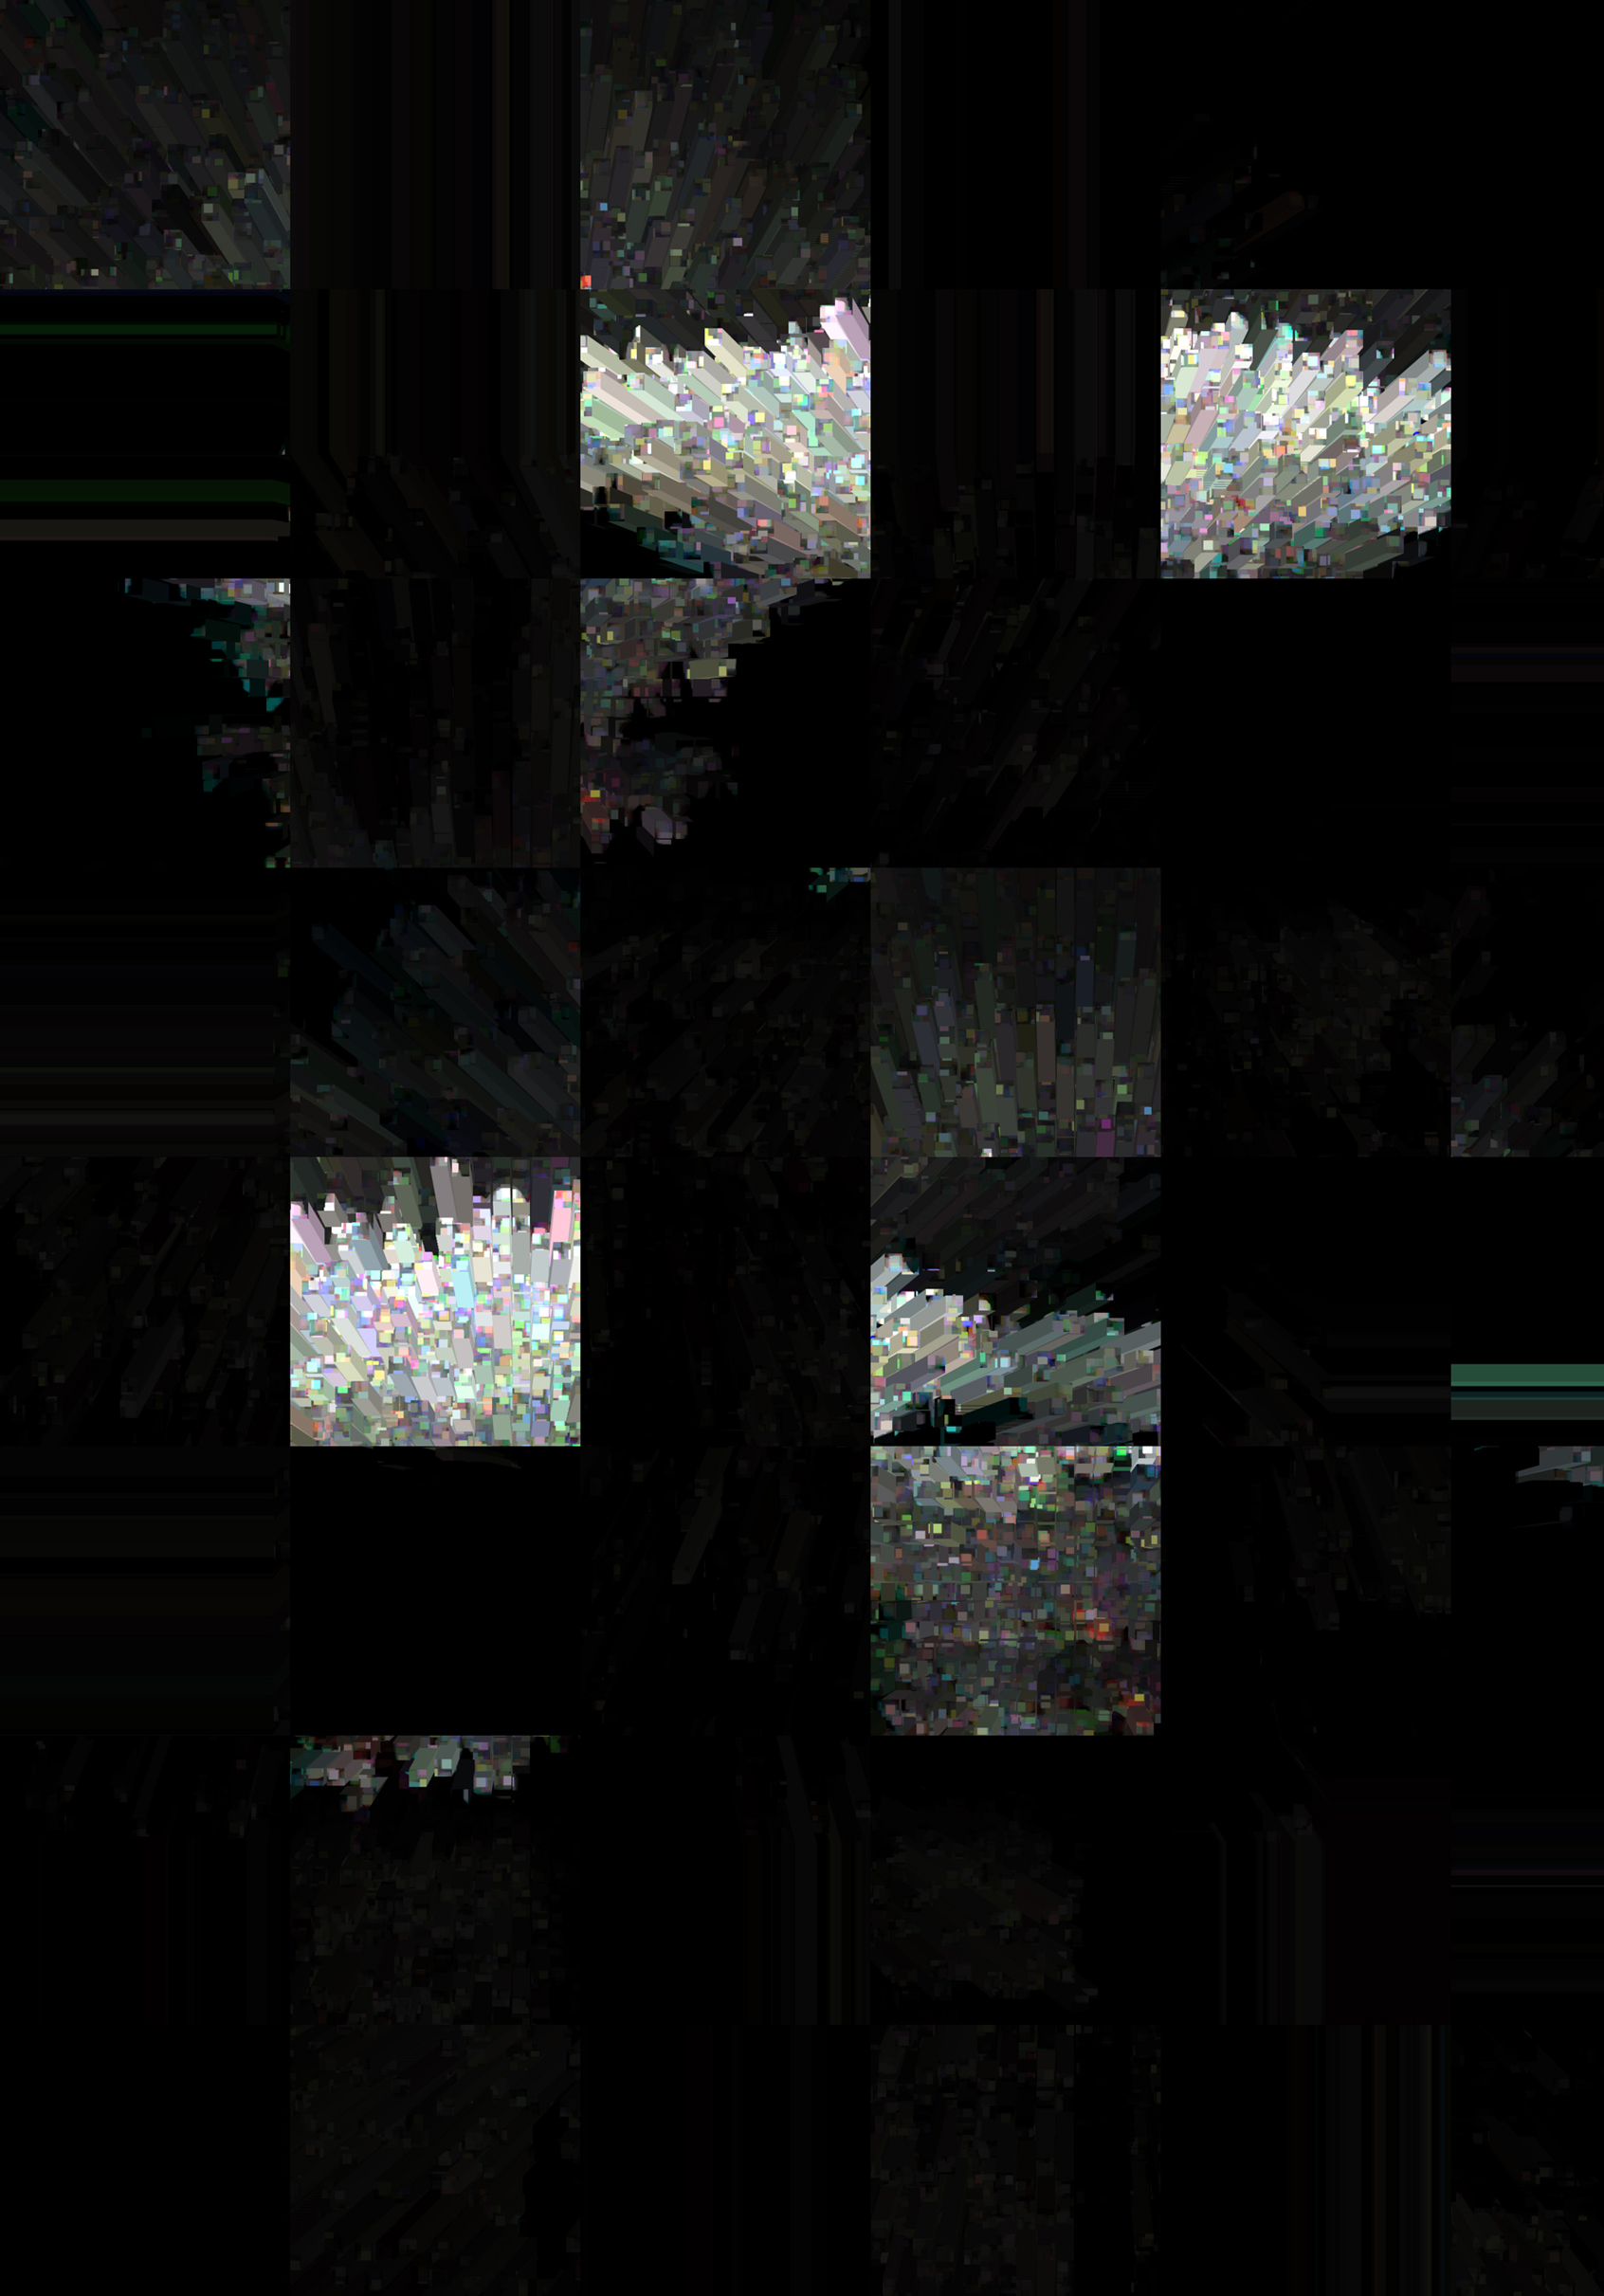 powidok_x5.jpg